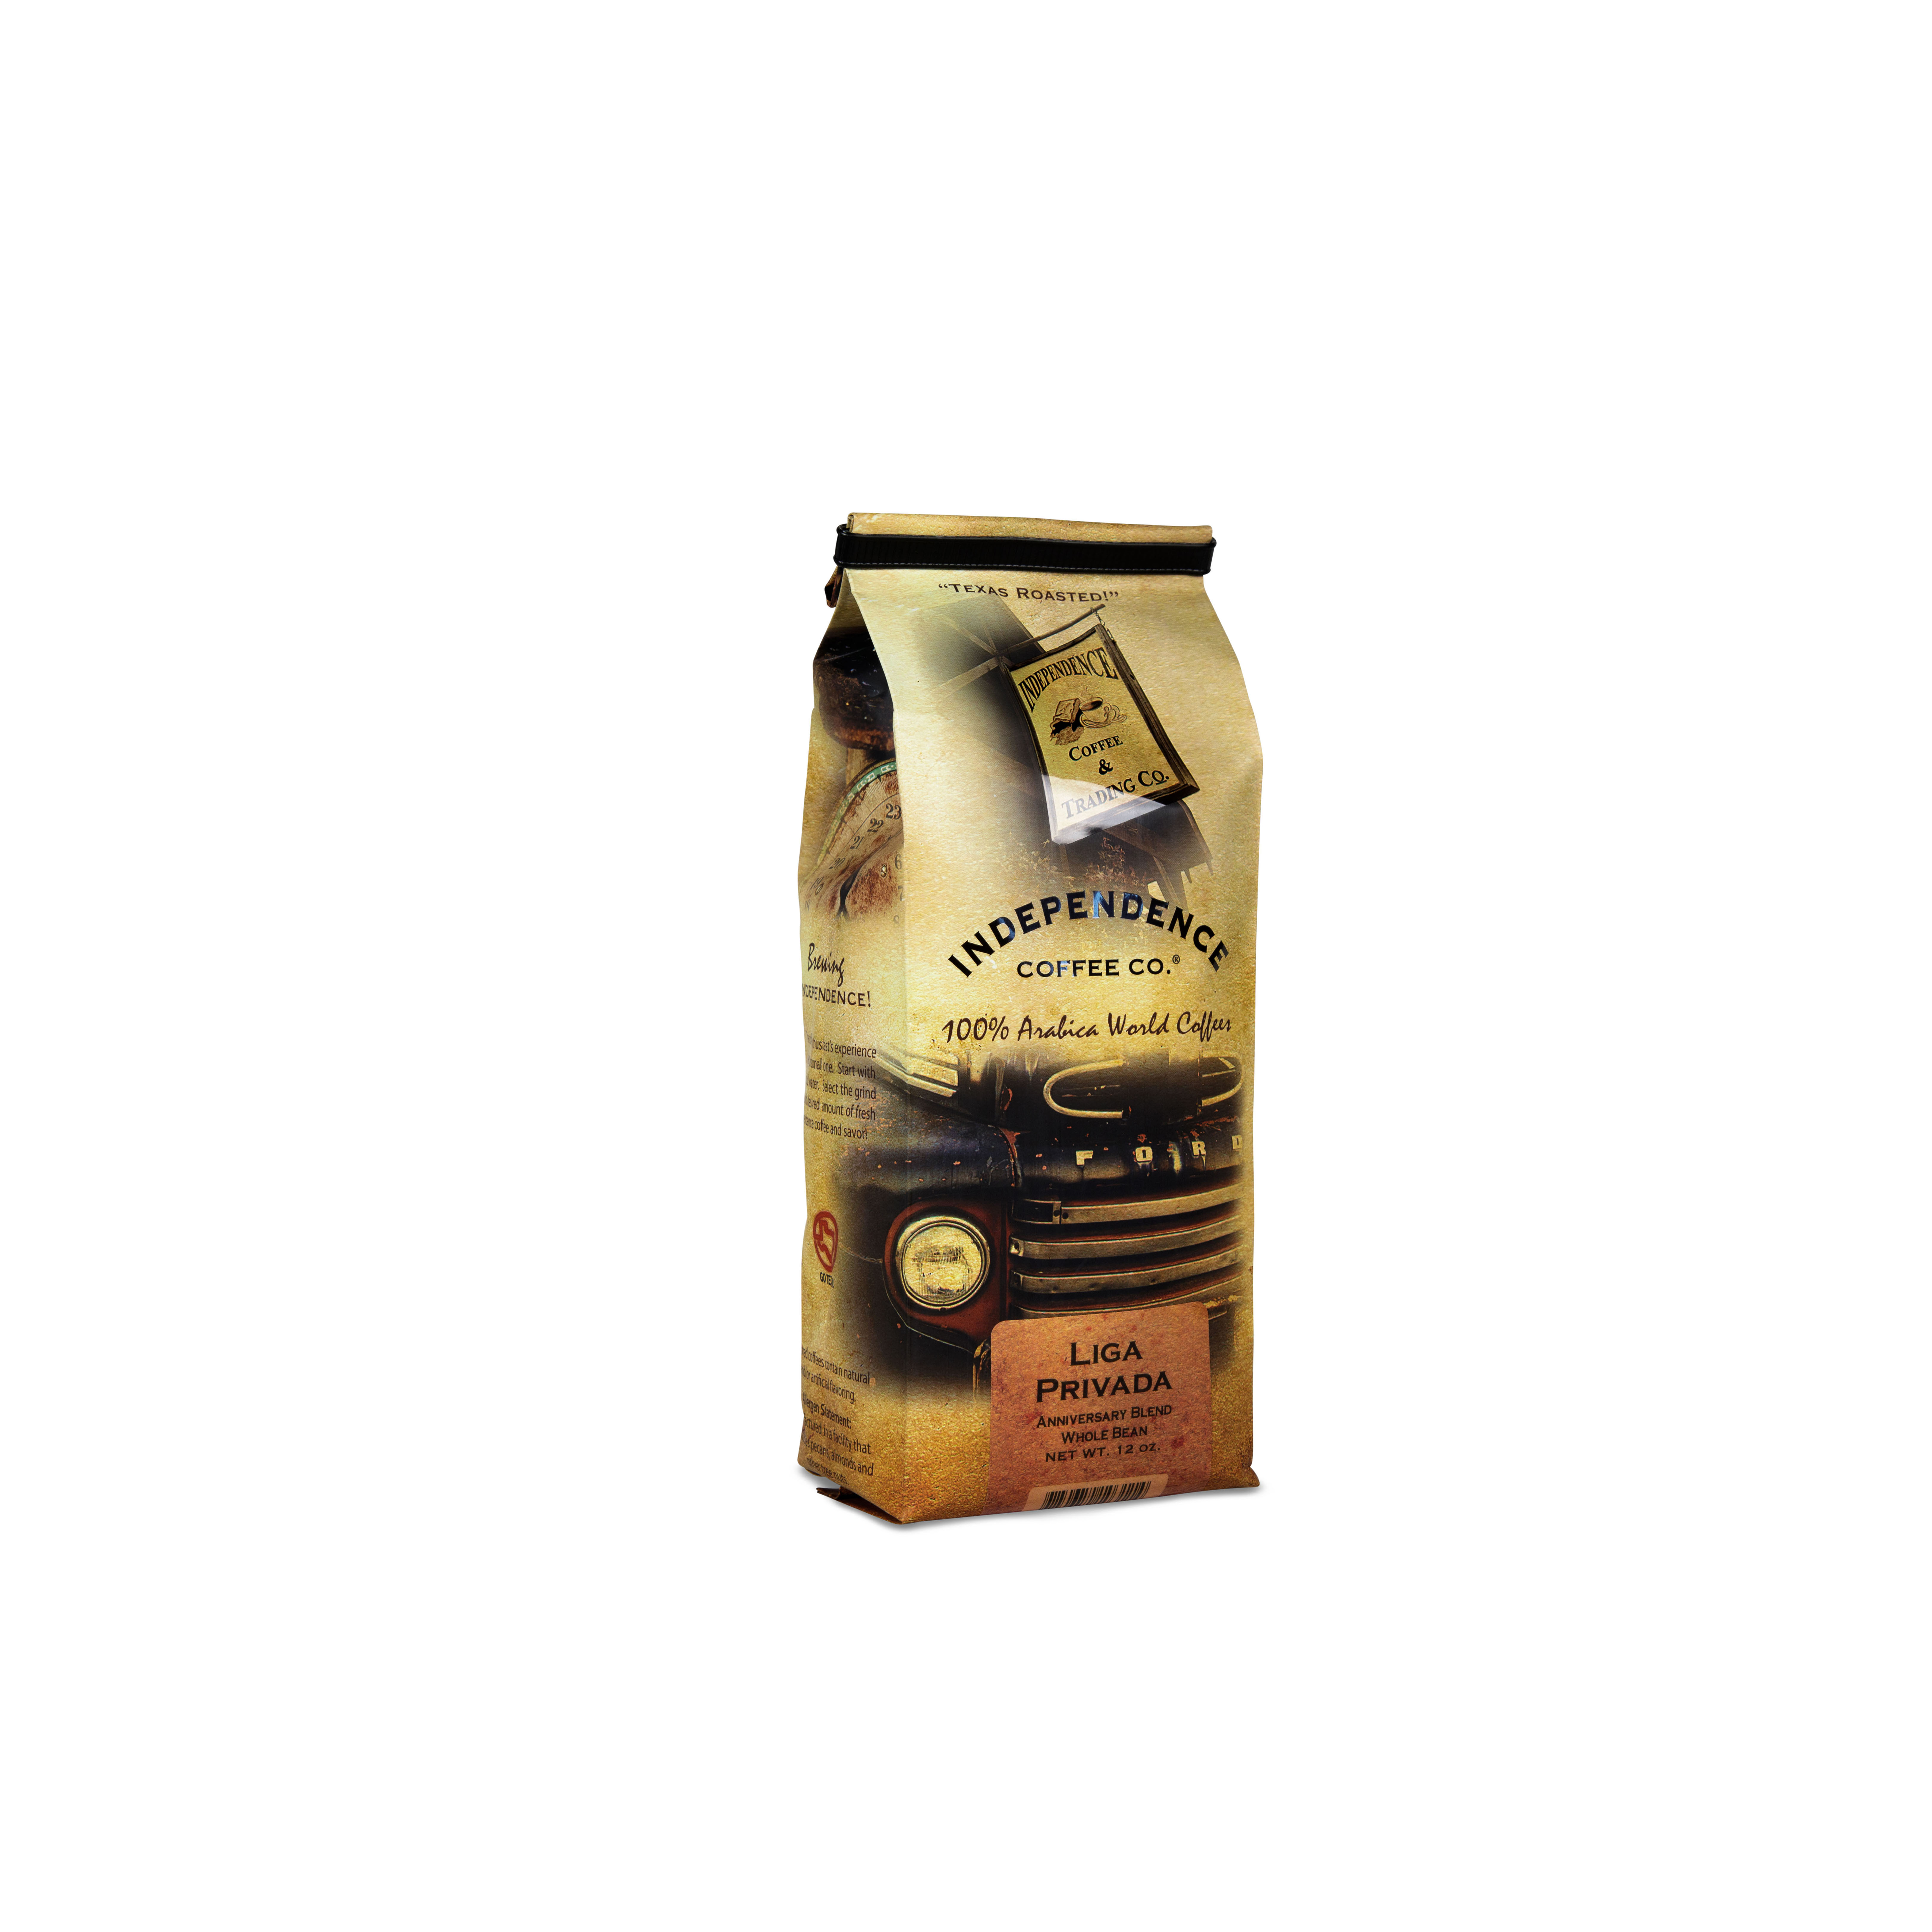 Independence Coffee Co. Liga Privada Mellow Non Flavored Arabica Medium Roast Whole Bean 12 oz.